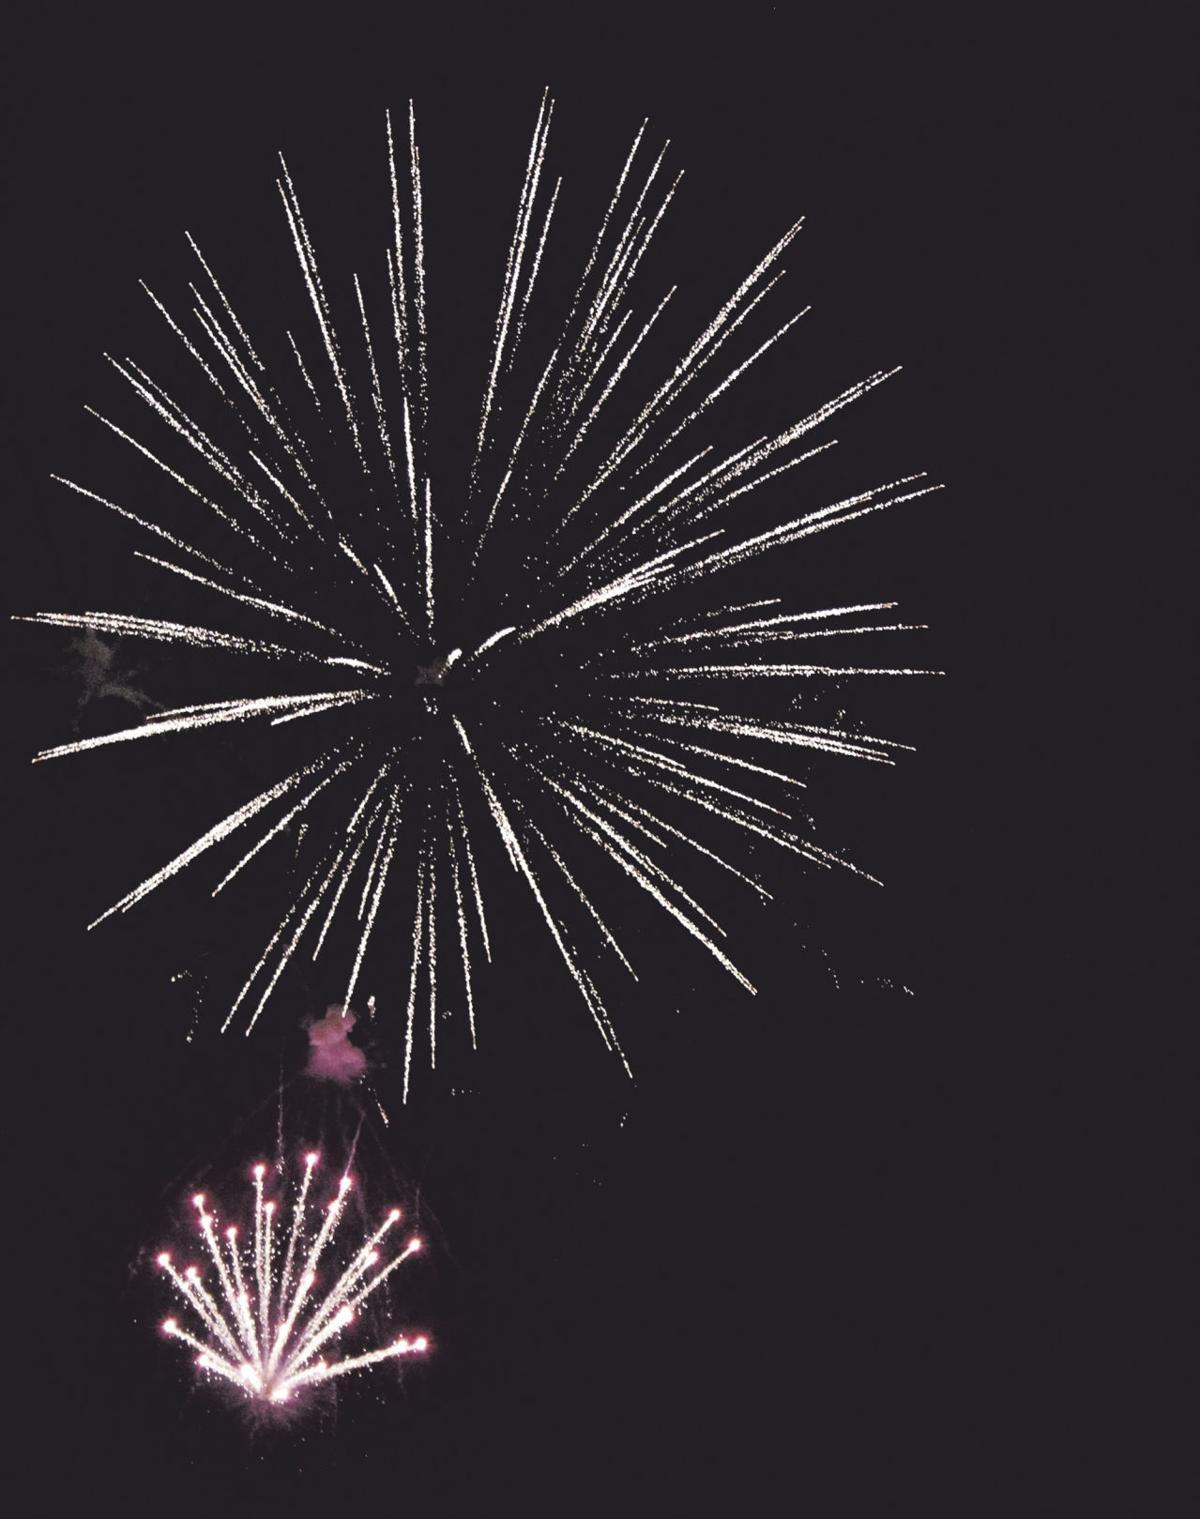 190707_hwnews_fireworks